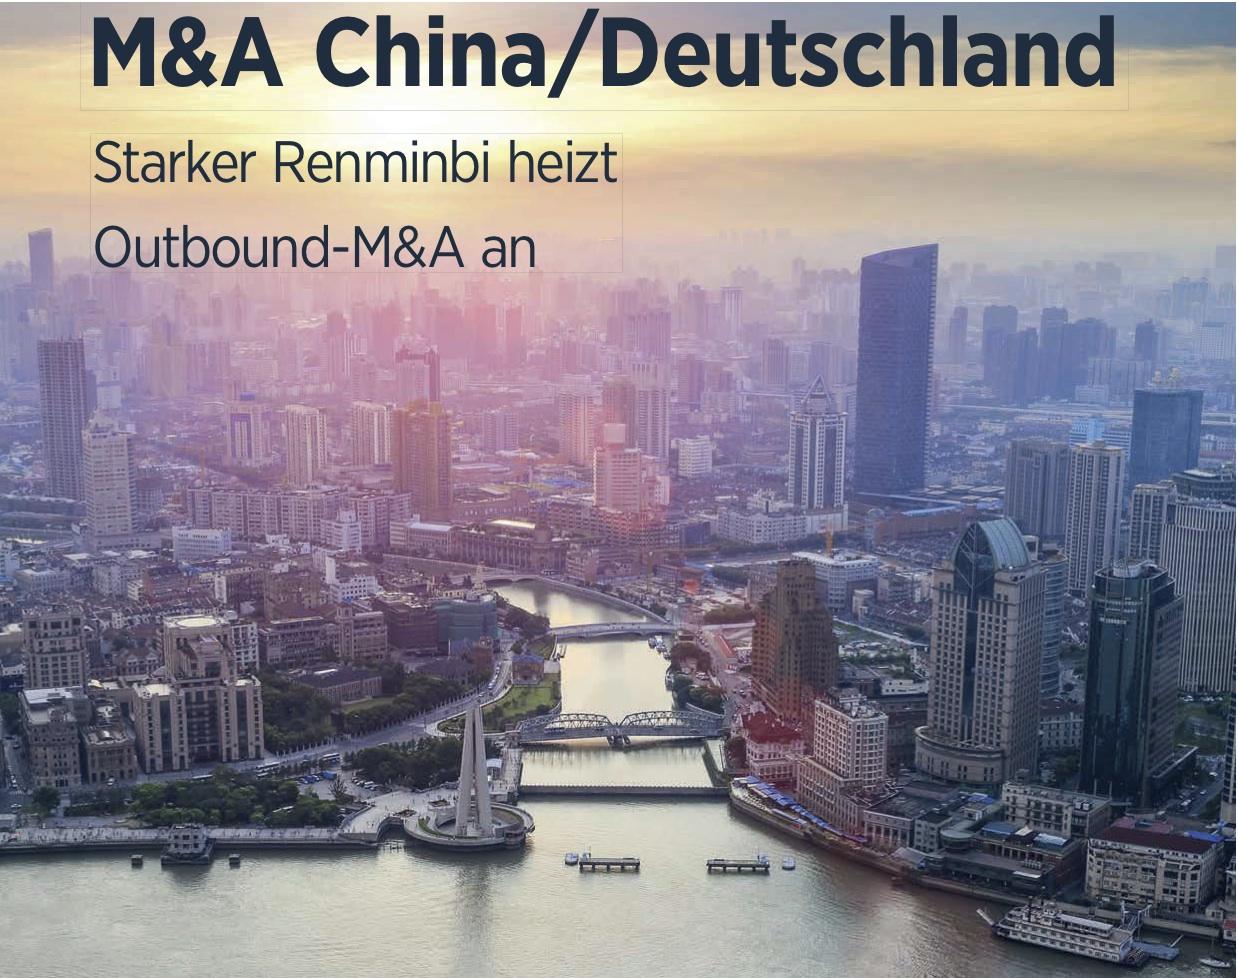 M&A China/Deutschland: Starker Renminbi Heizt Outbound-M&A An